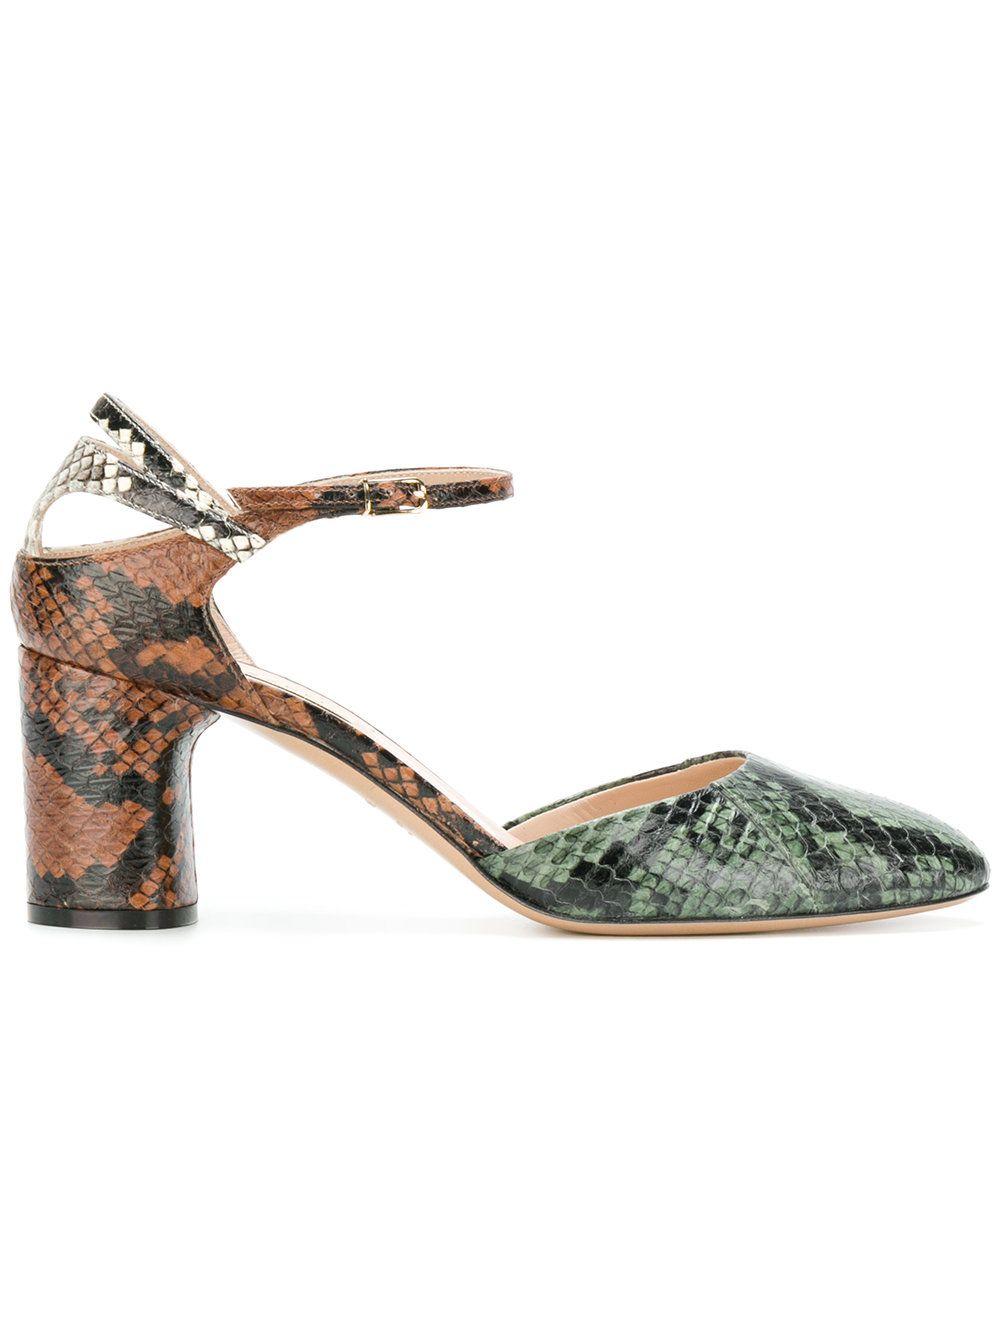 44cac312b55 CASADEI | snakeskin block-heel pumps #Shoes #CASADEI | Fashion